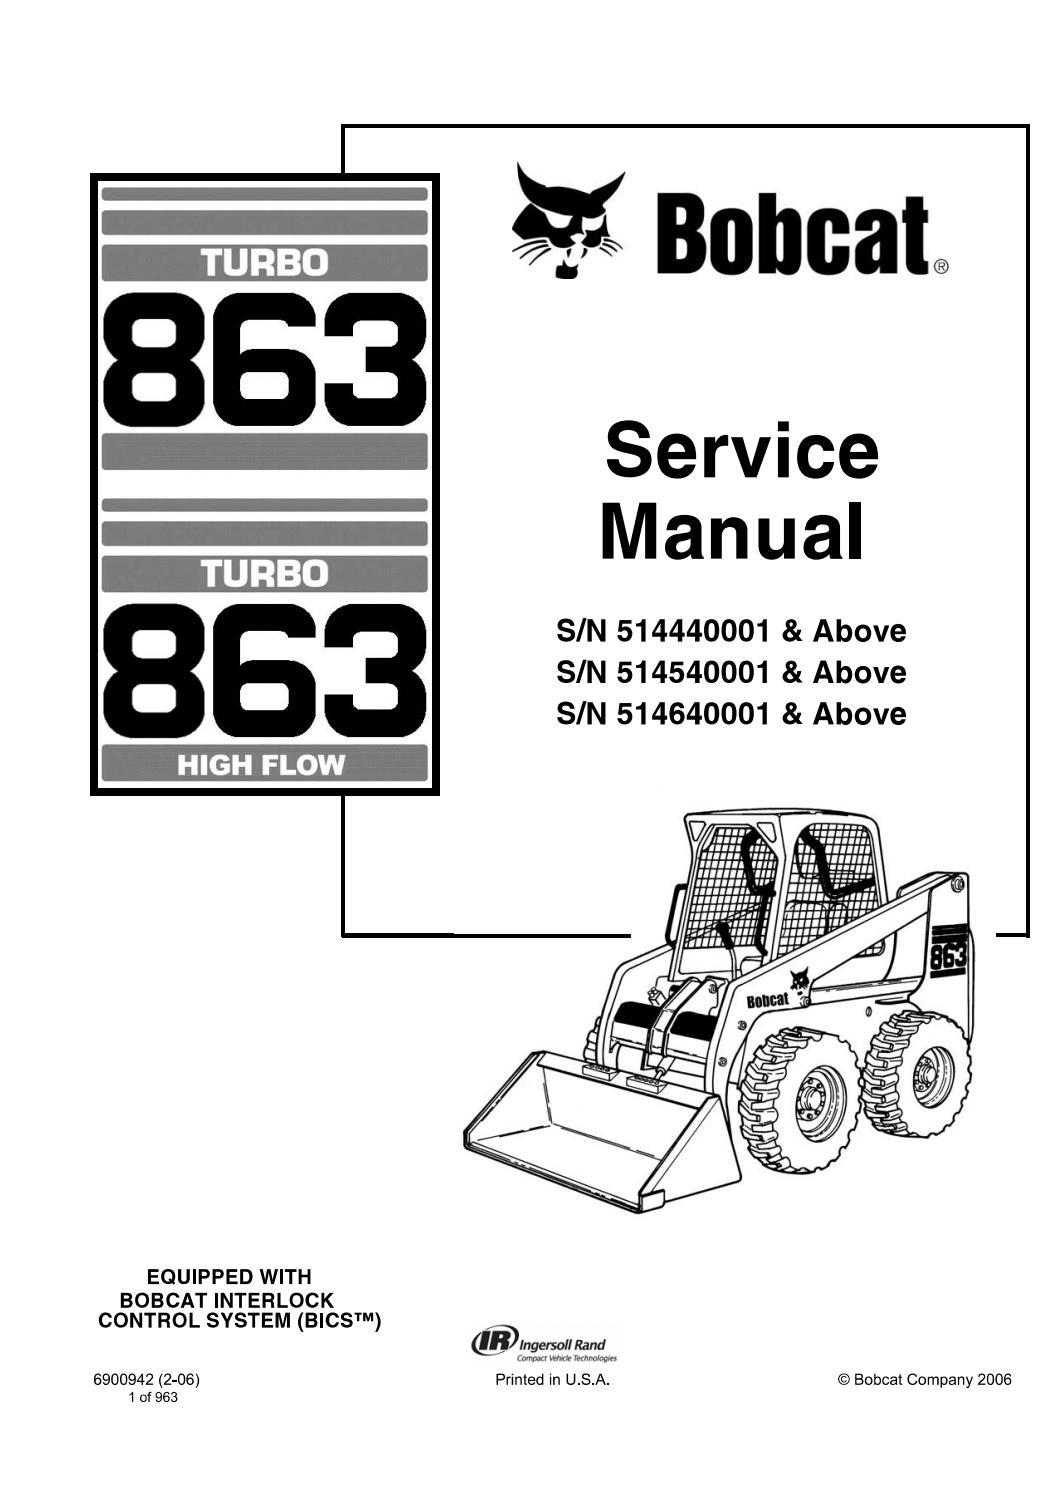 Bobcat Turbo 863, Turbo 863 High Flow Skid Steer Loader